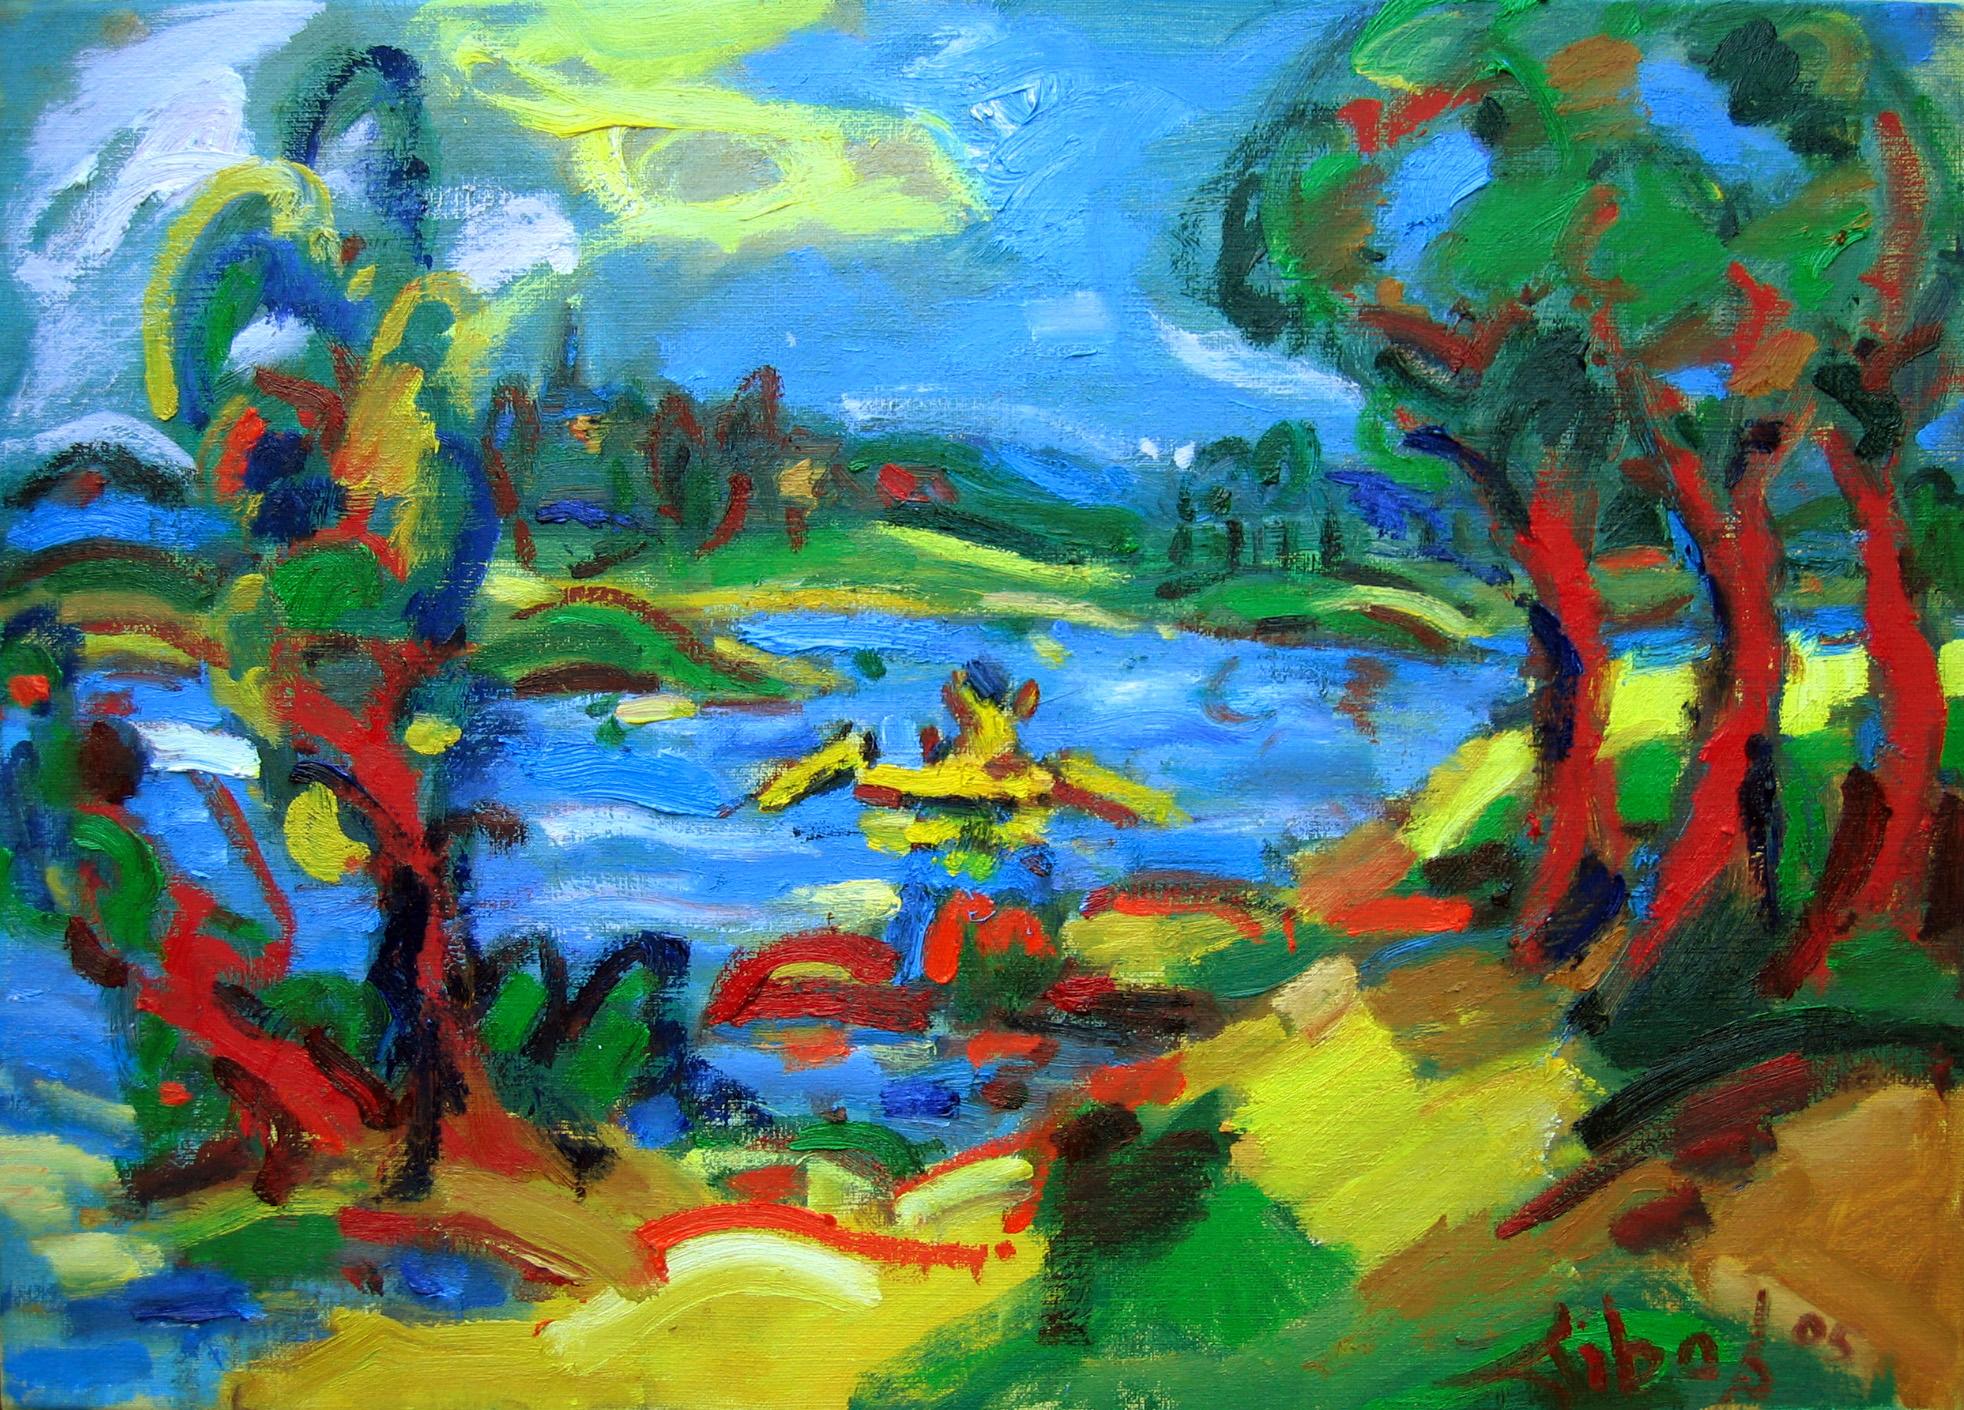 IJssel landschap Olieverf op linnen 50 x 70 cm